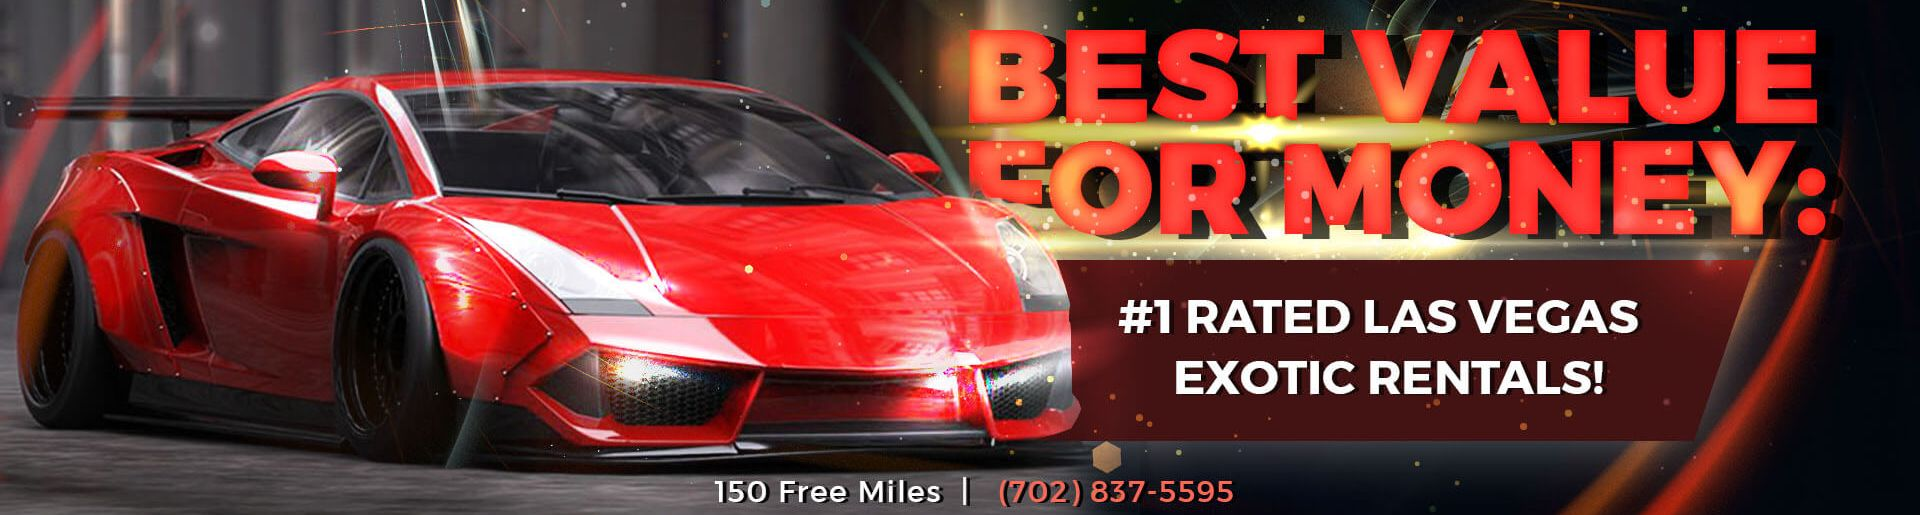 Lamborghini Gallardo Rental Las Vegas 24hr For The Price